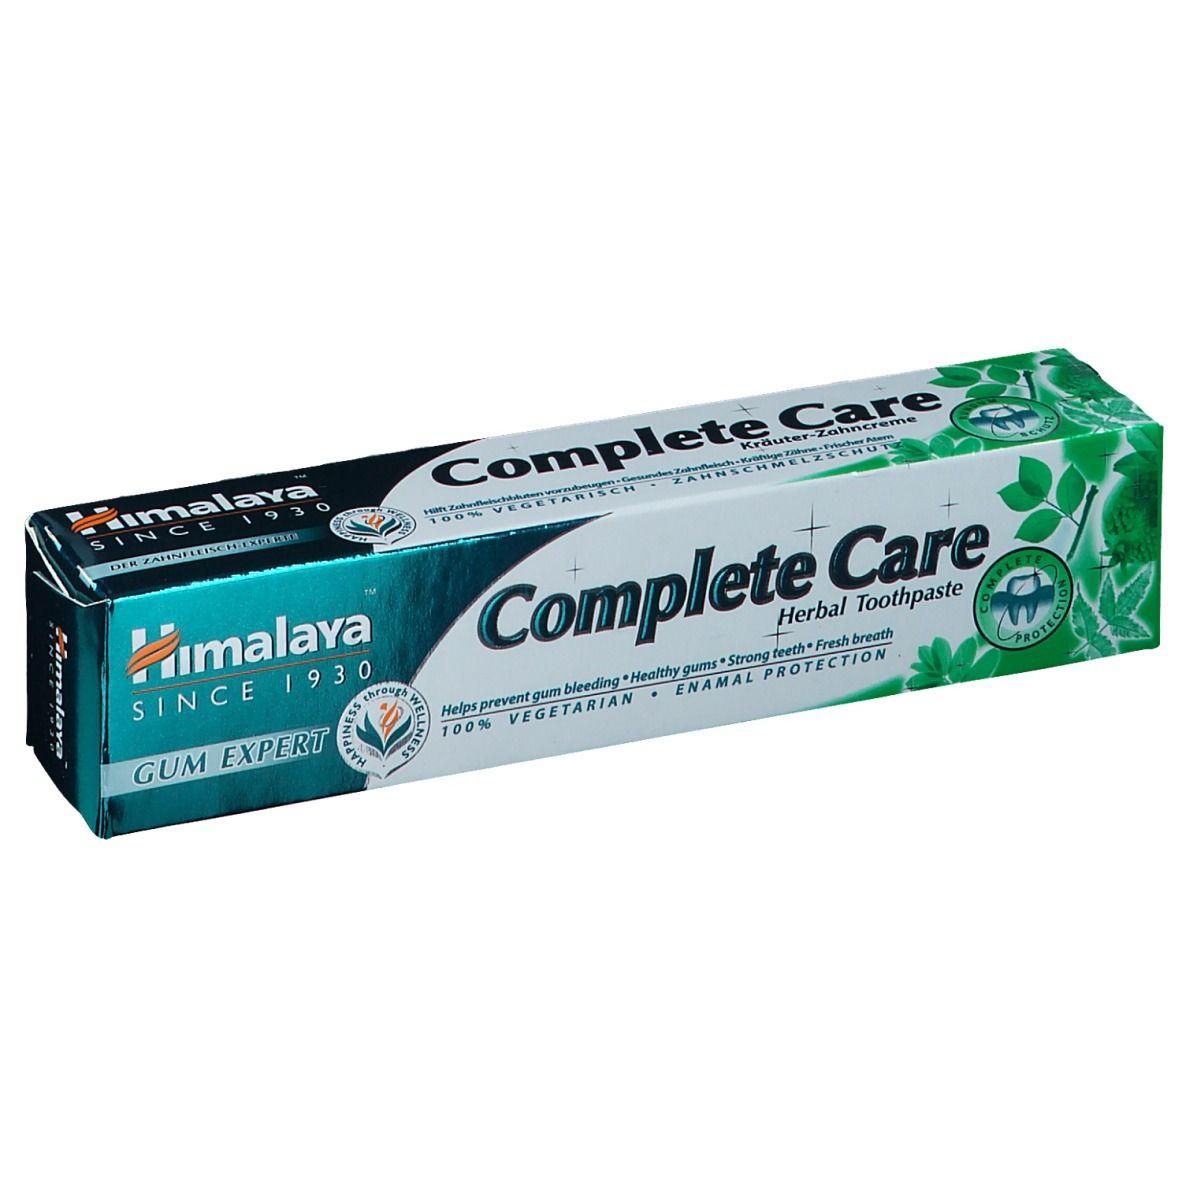 Himalaya Dentifrice Care blancheur 50 ml et 100 ml